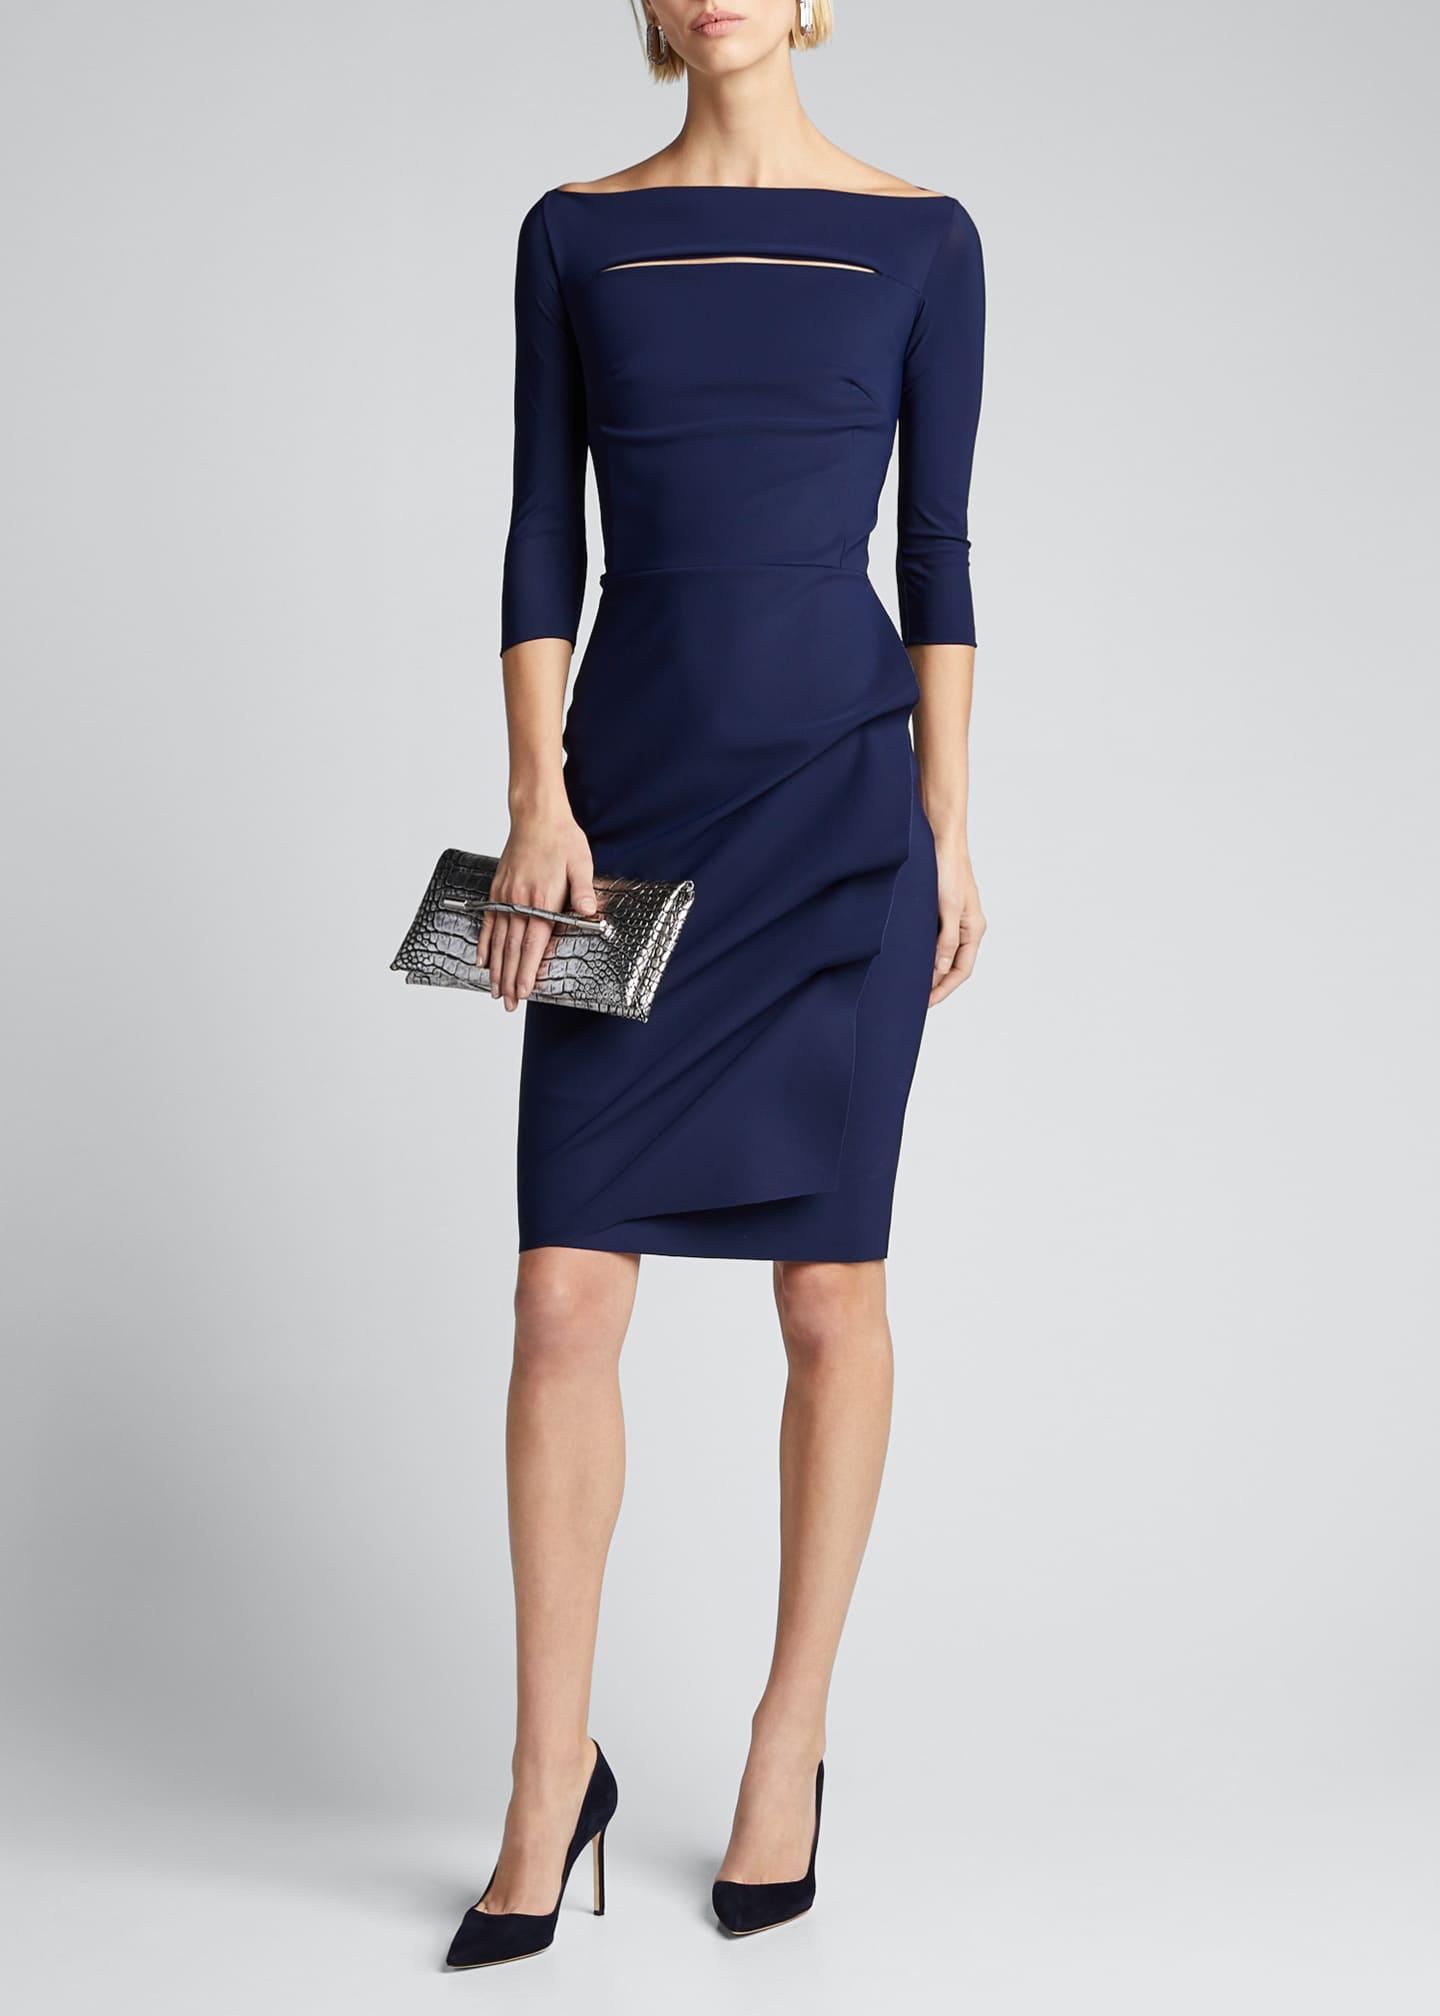 Chiara Boni La Petite Robe Melania Off-the-Shoulder 3/4-Sleeve